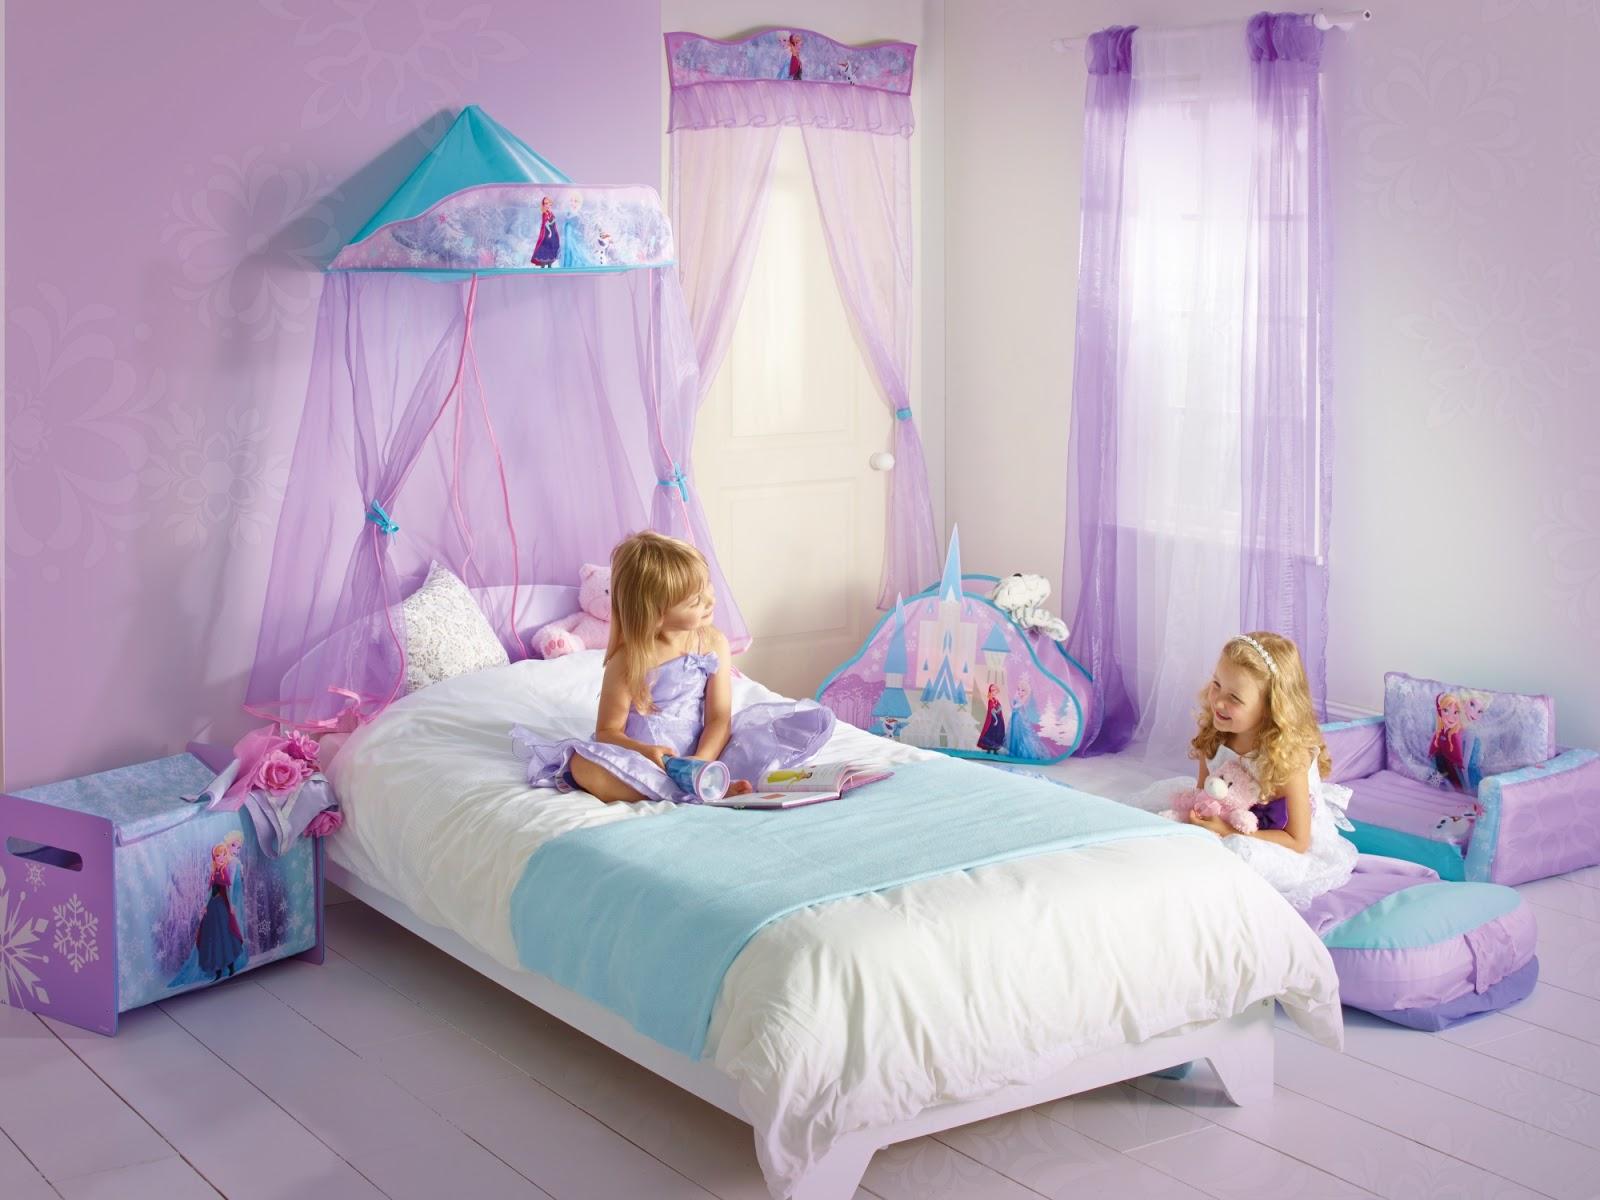 Desain Foto Dinding Kamar Tidur Frozen Anak Perempuan Remaja